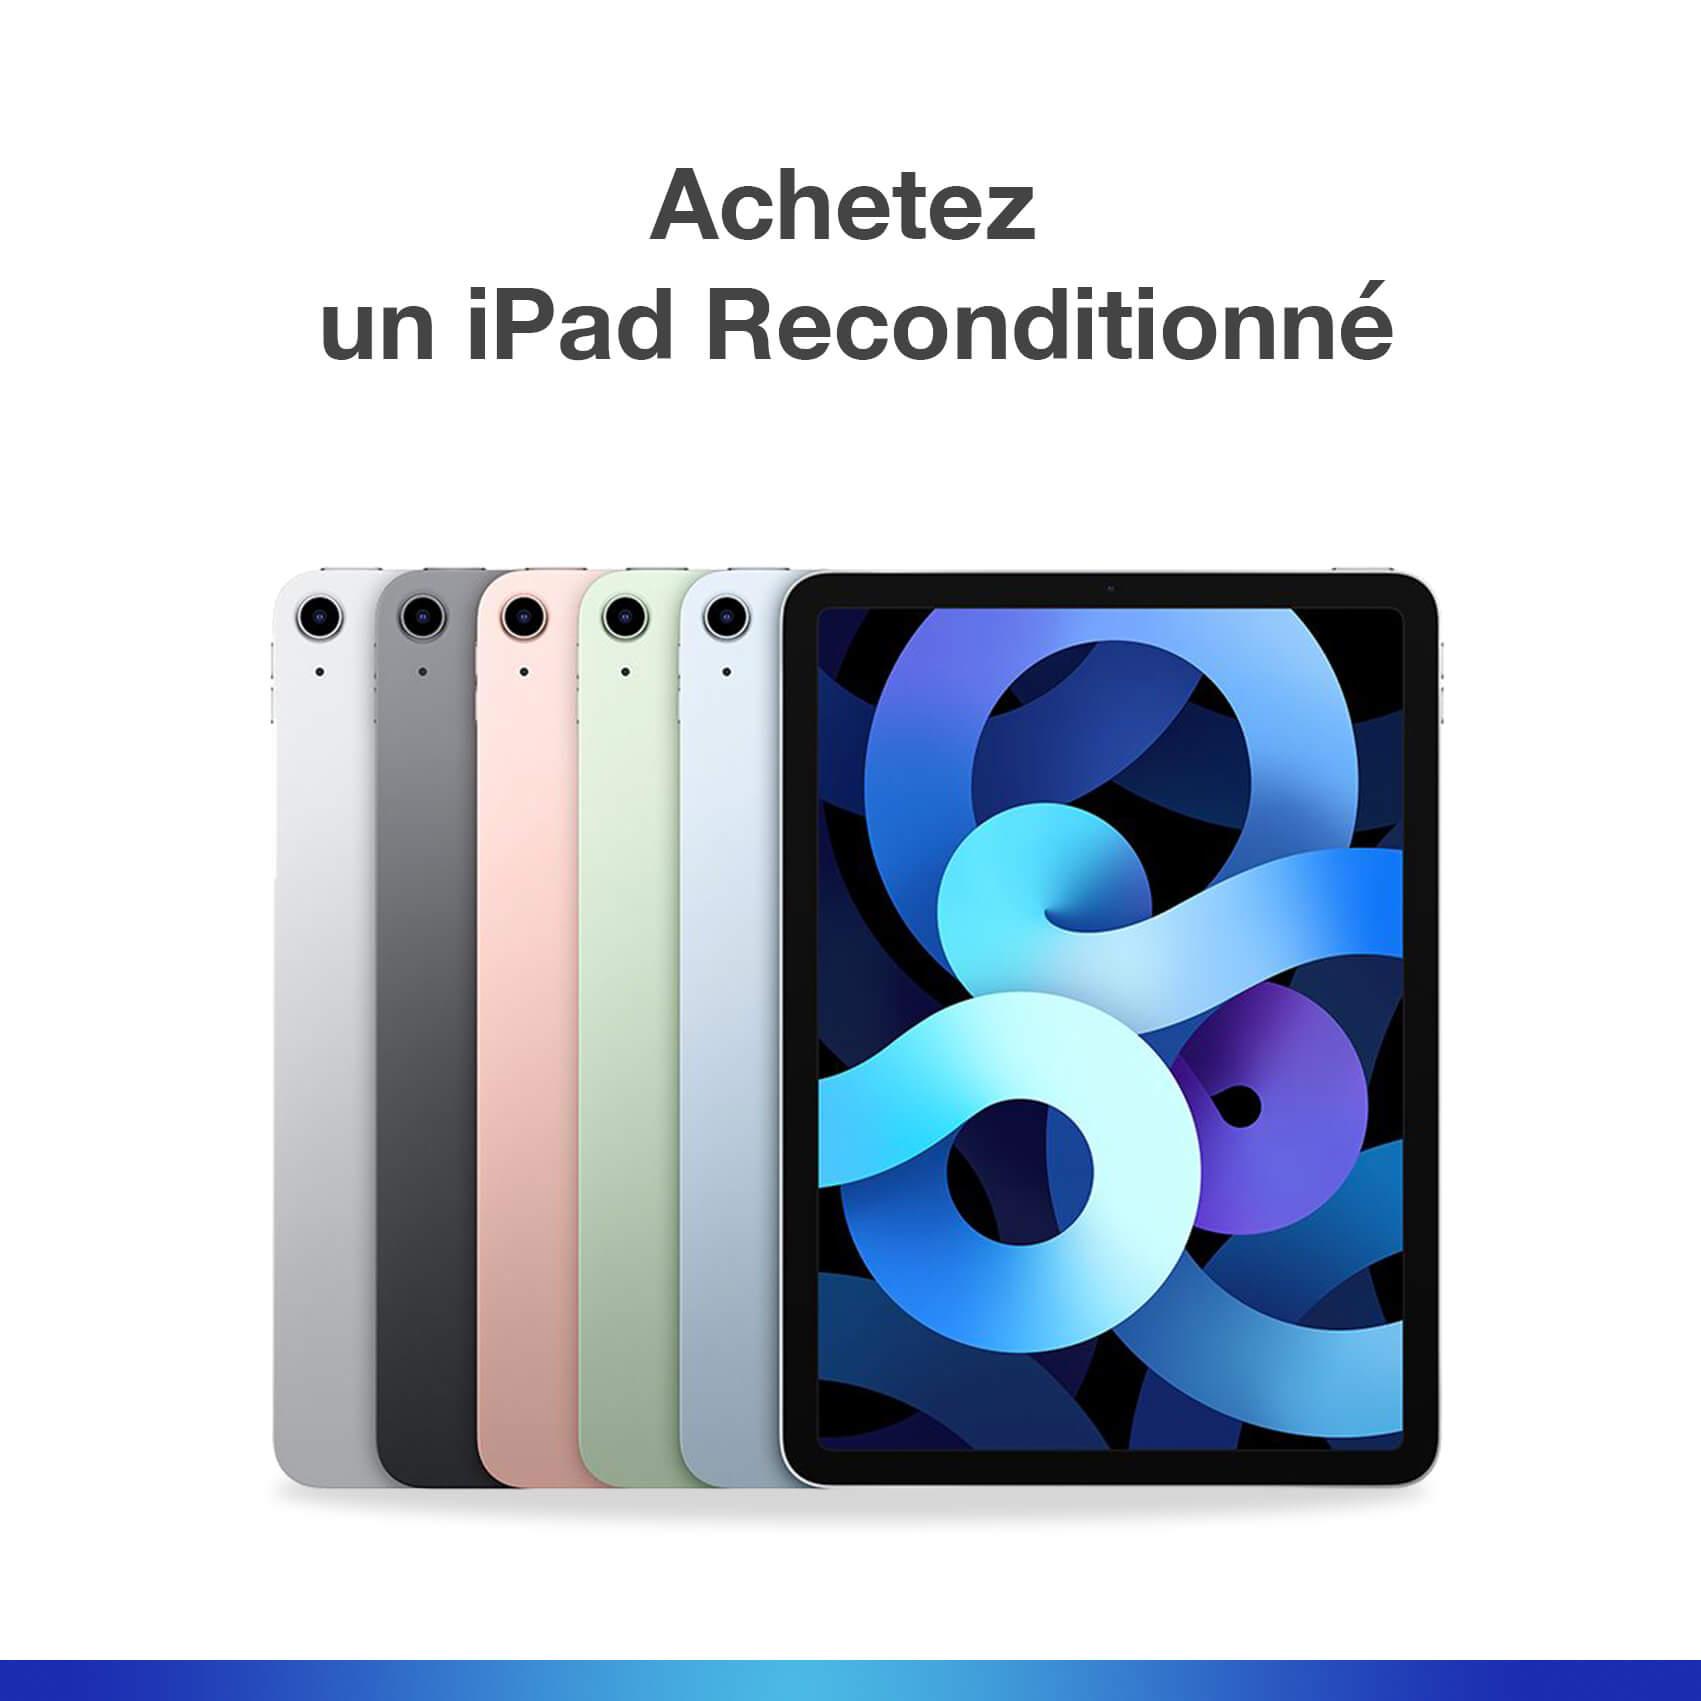 Achetez un iPad Reconditionné| McPrice Paris Trocadéro